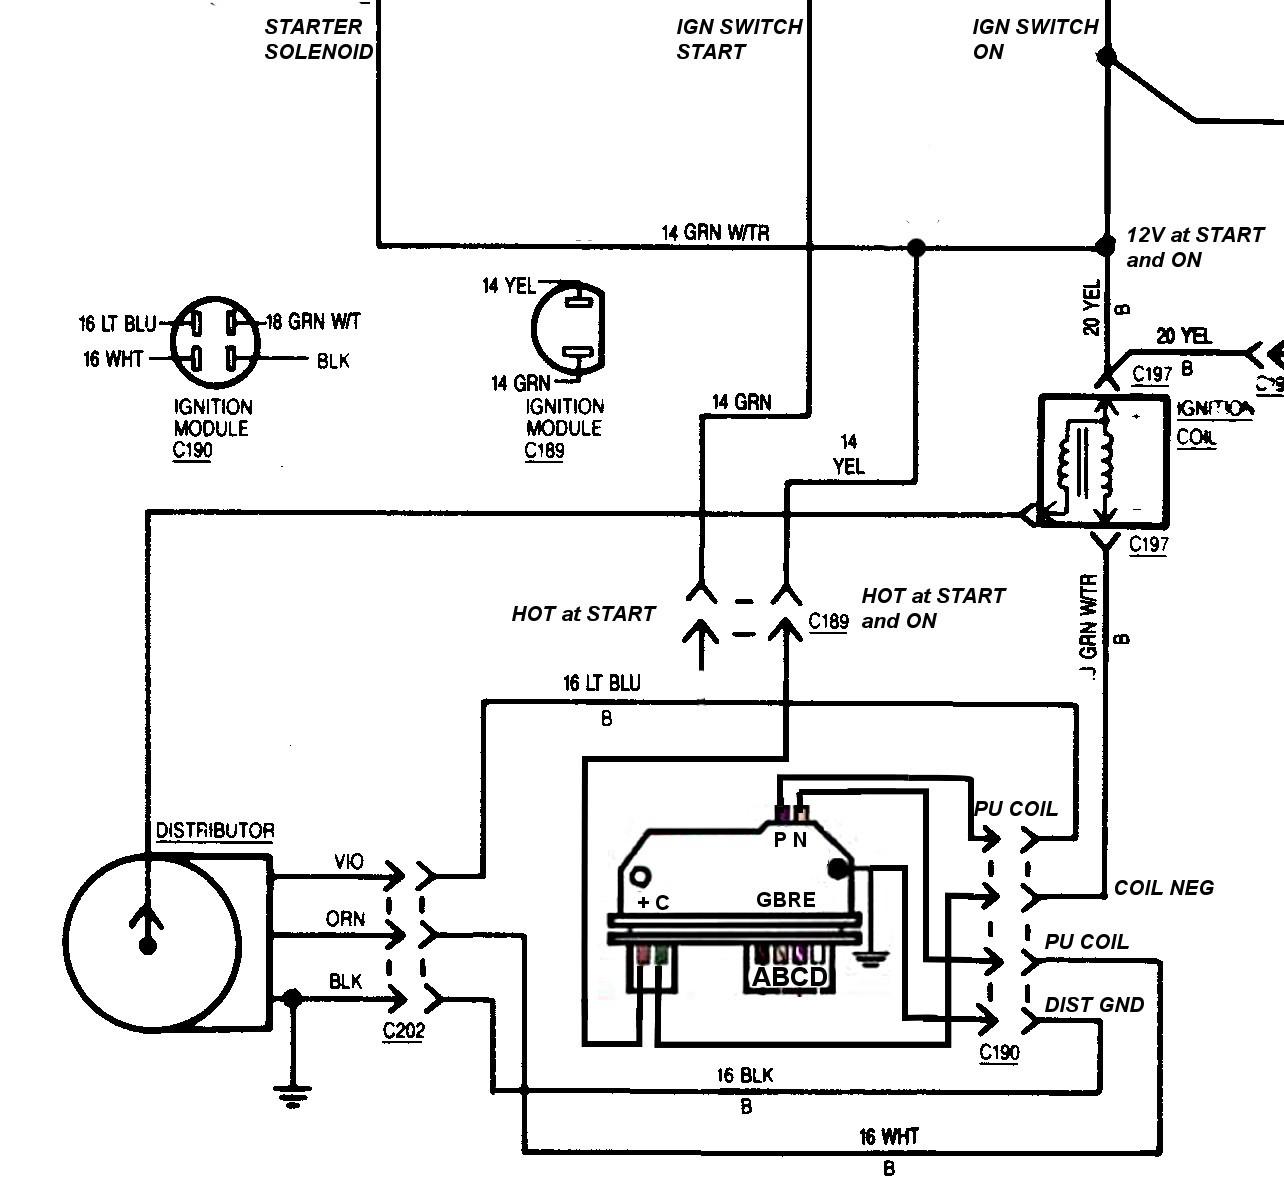 hight resolution of duraspark wiring chrysler house wiring diagram symbols u2022 duraspark ii ignition module wiring duraspark ignition